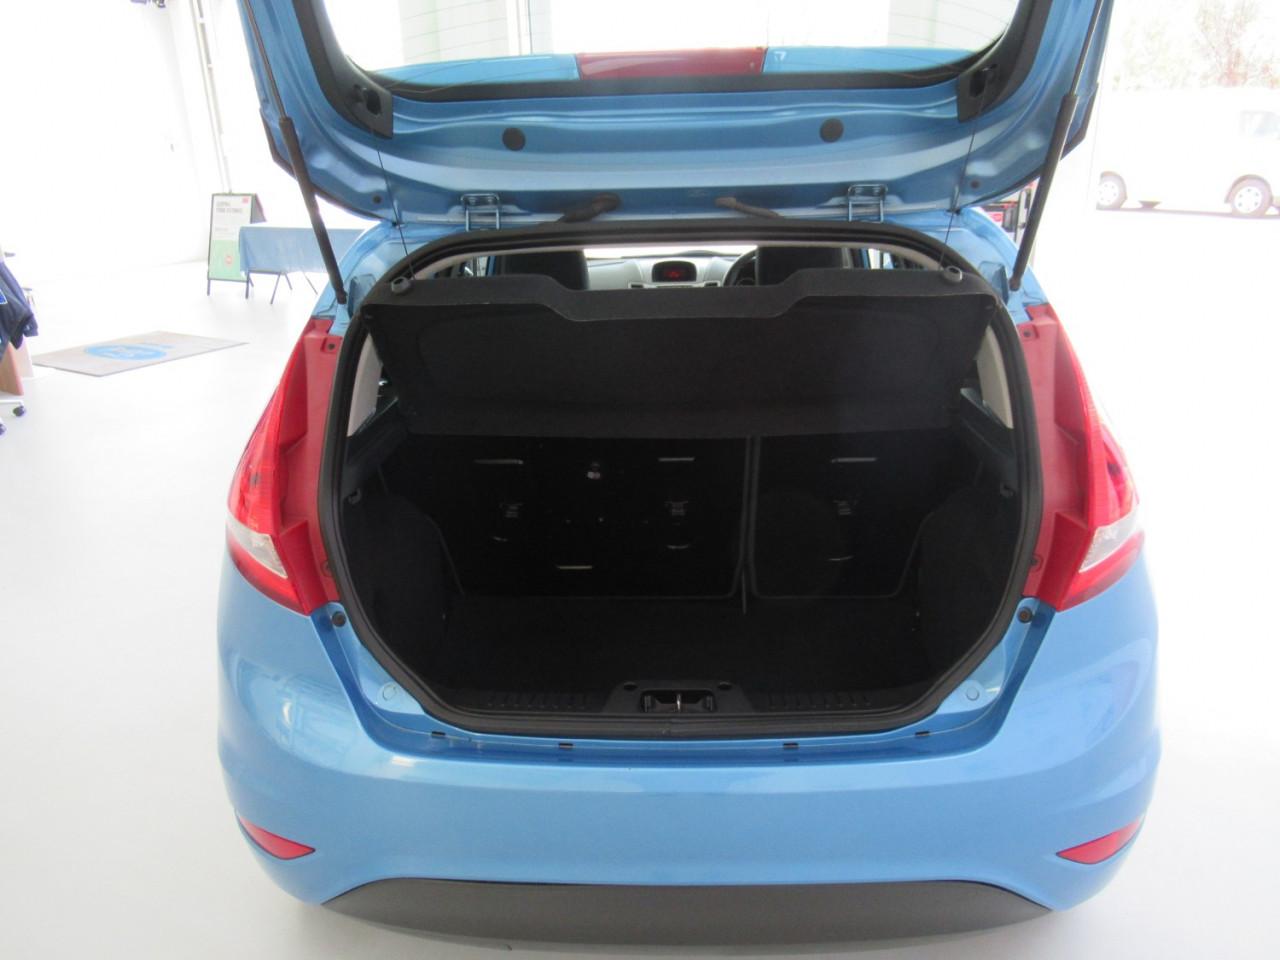 2009 Ford Fiesta WS CL Hatchback Image 21